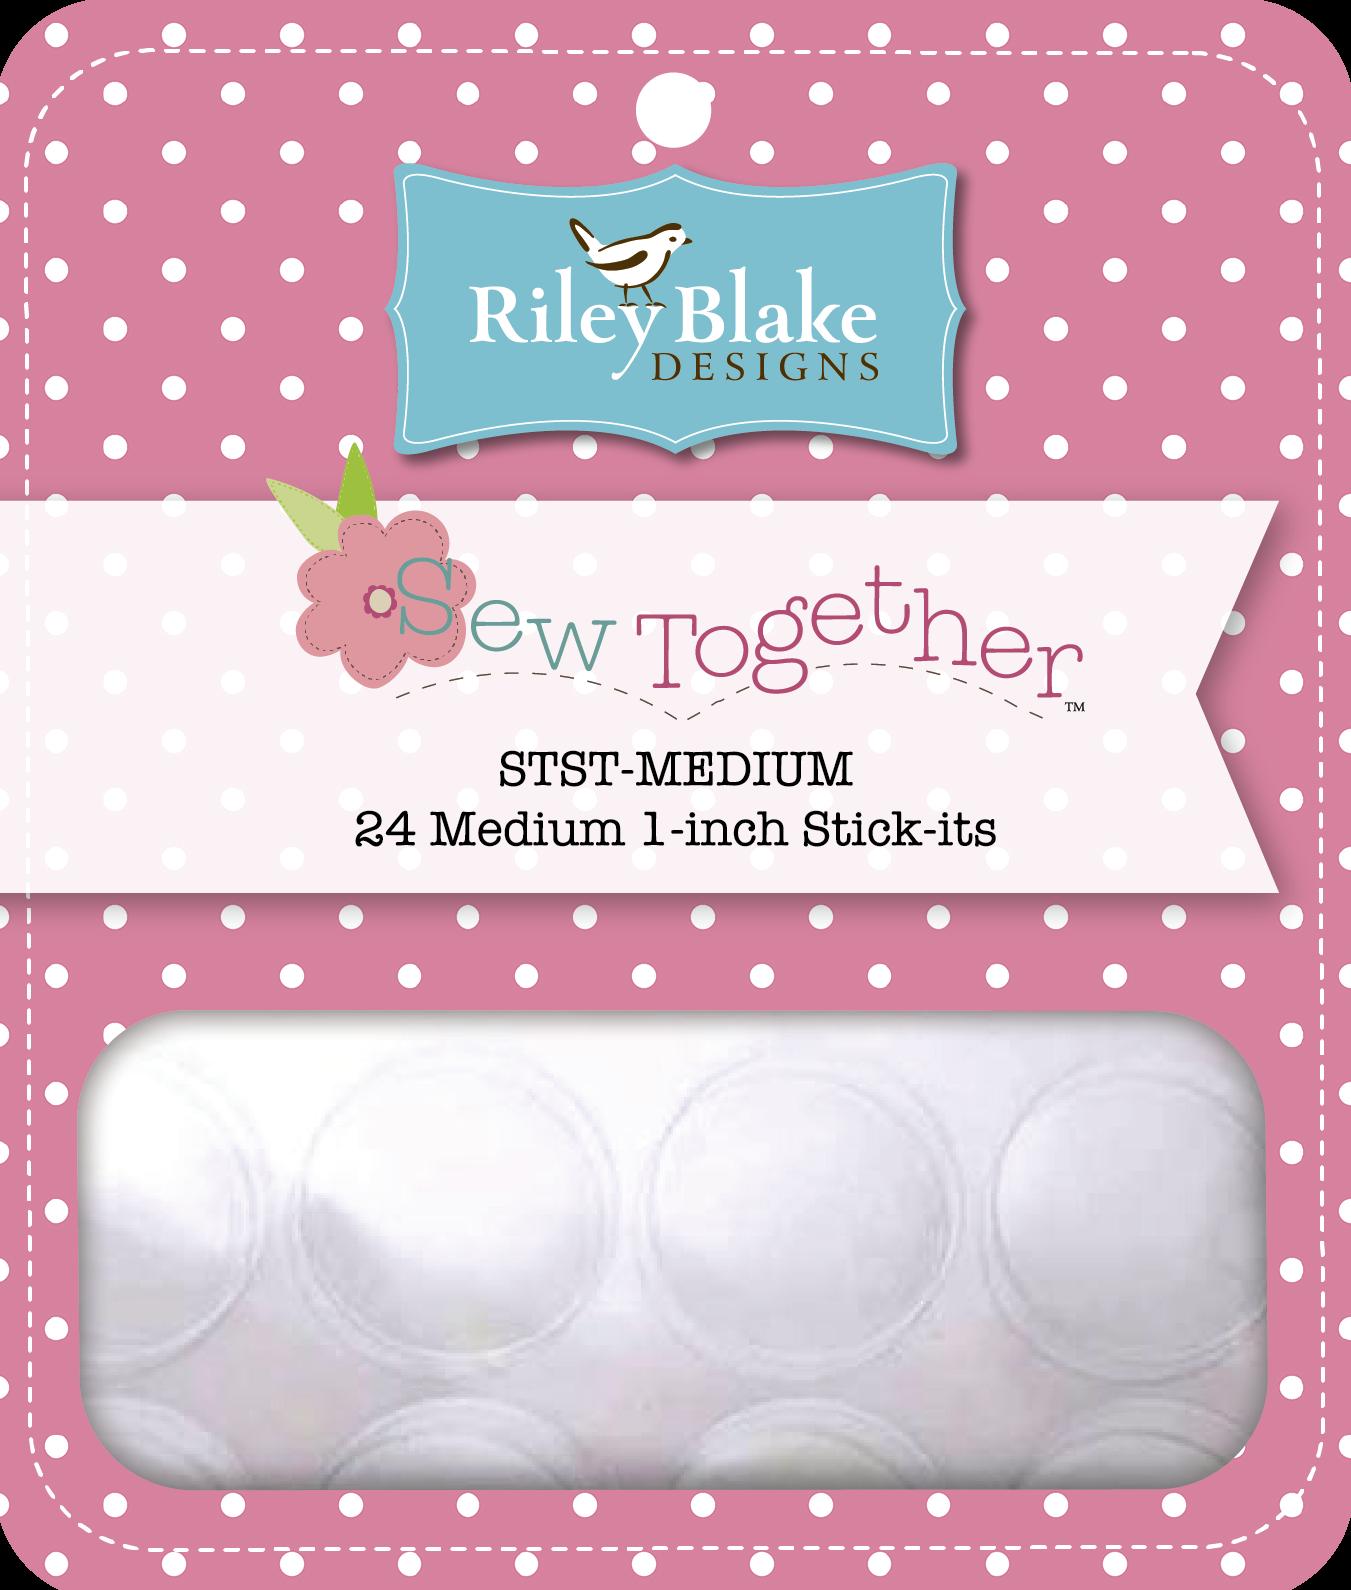 Stick-its- Riley Blake- 24 Medium 1-inch